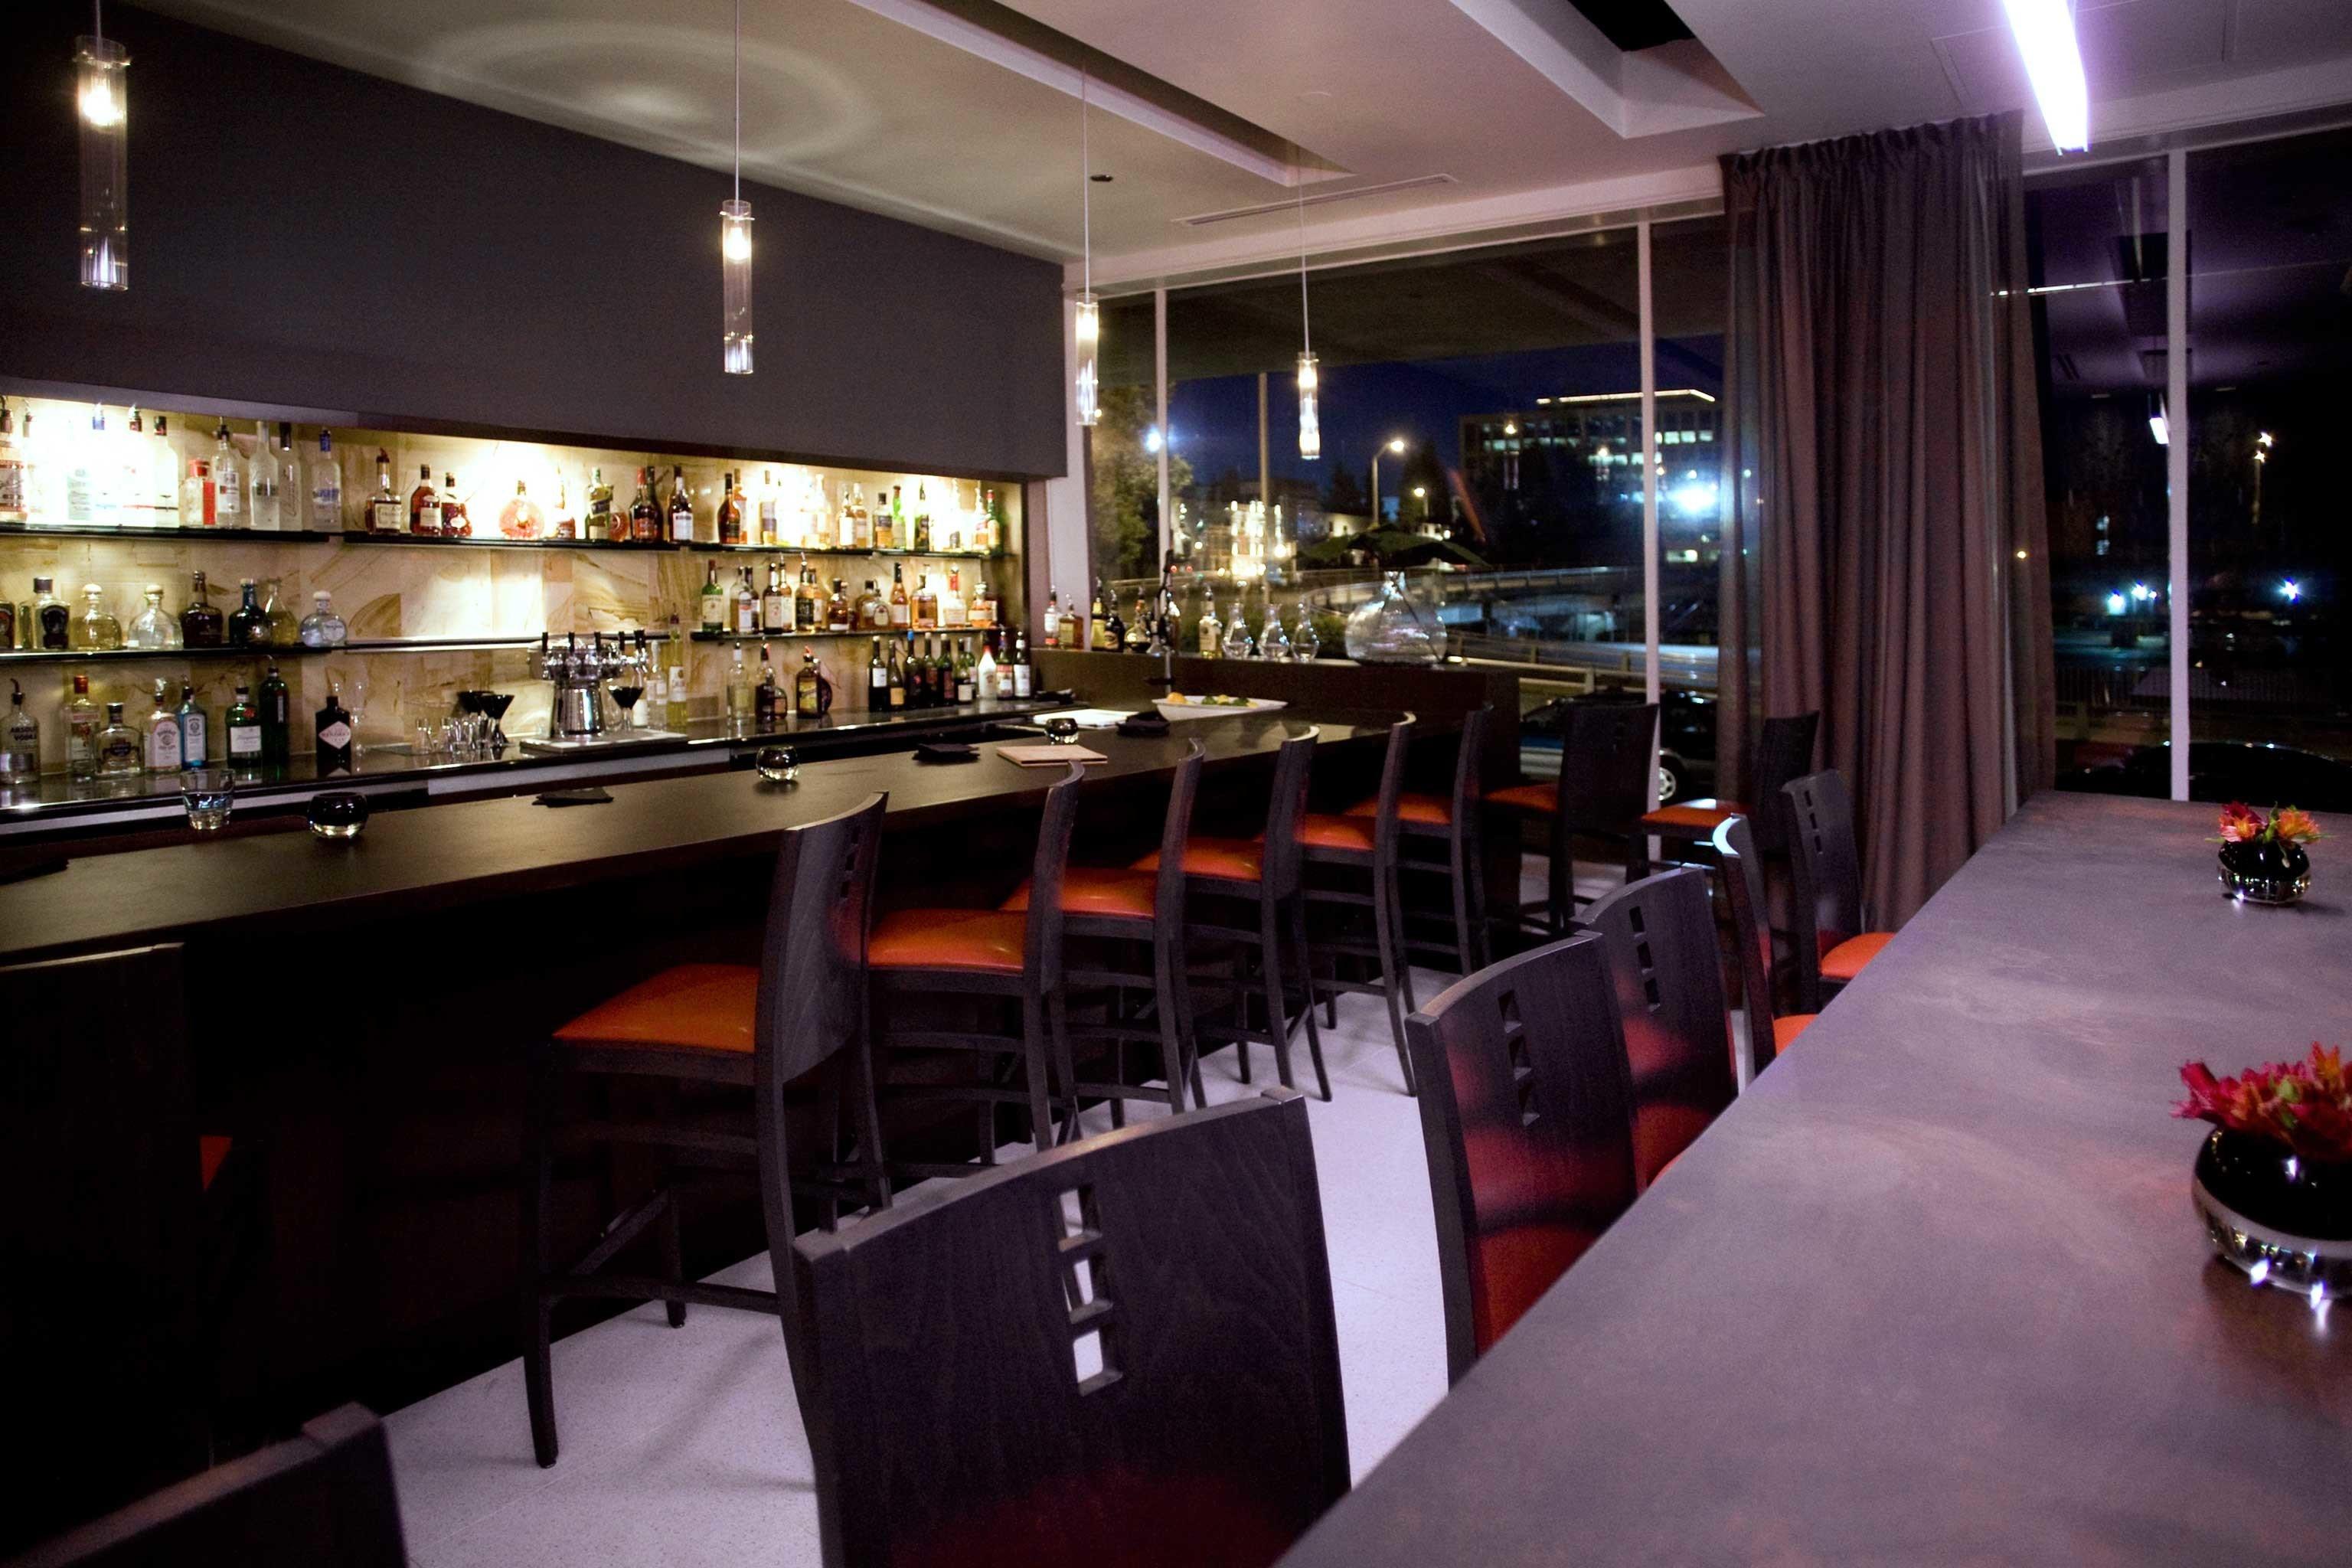 Bar Dining Drink Eat Modern restaurant function hall